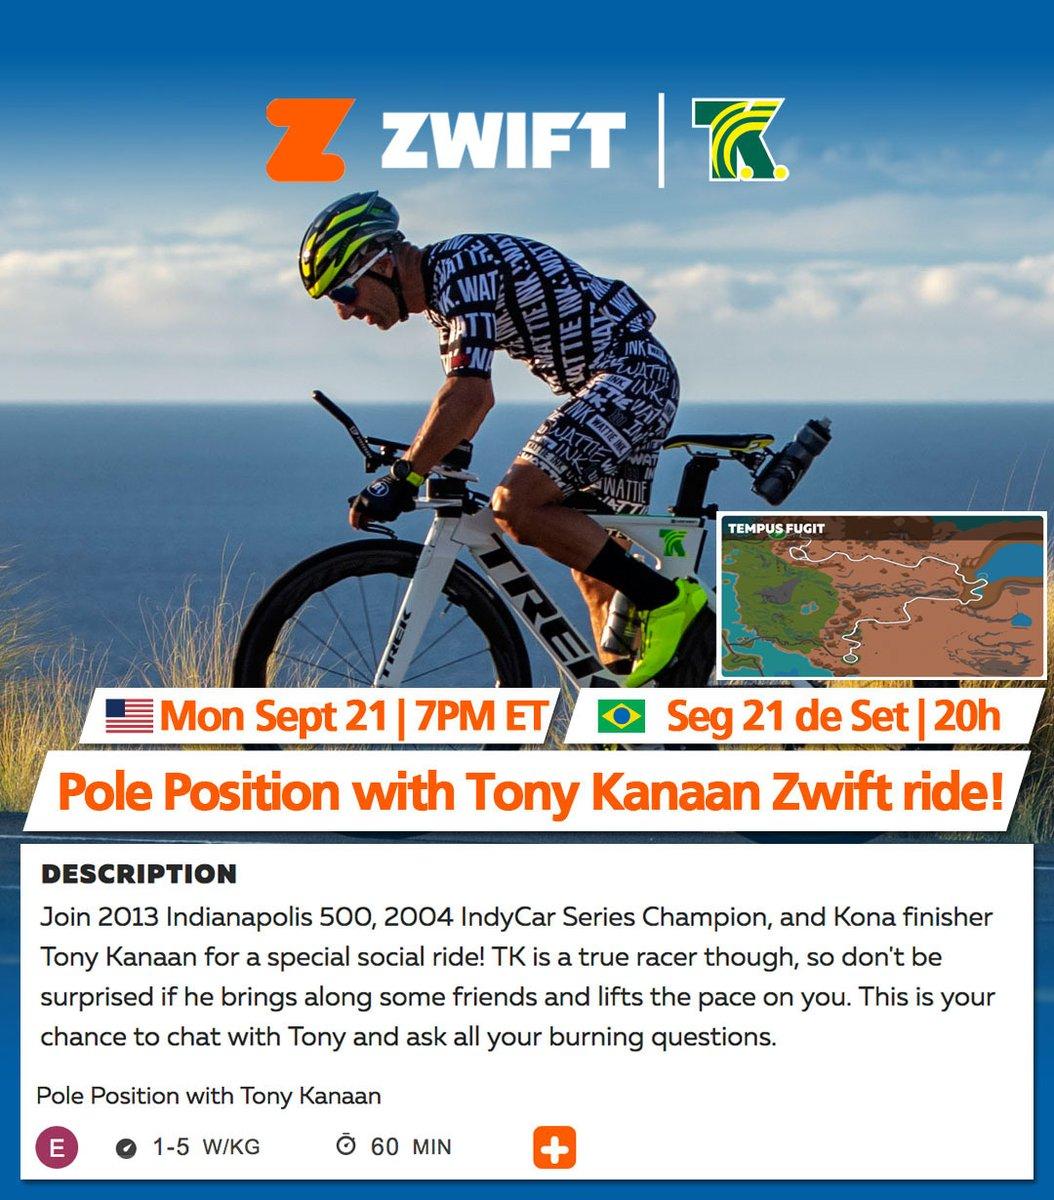 🇧🇷 🗓 ⏰ ➡️ Hoje, segunda dia 21 de setembro 20h do 🇧🇷 tem nosso ride no @GoZwift @GoZwiftTri. Encontre o ride no Companion app ou pelo 👉🏻 https://t.co/BuPonkFCui. #GoZwift https://t.co/qYxMfvzYaJ